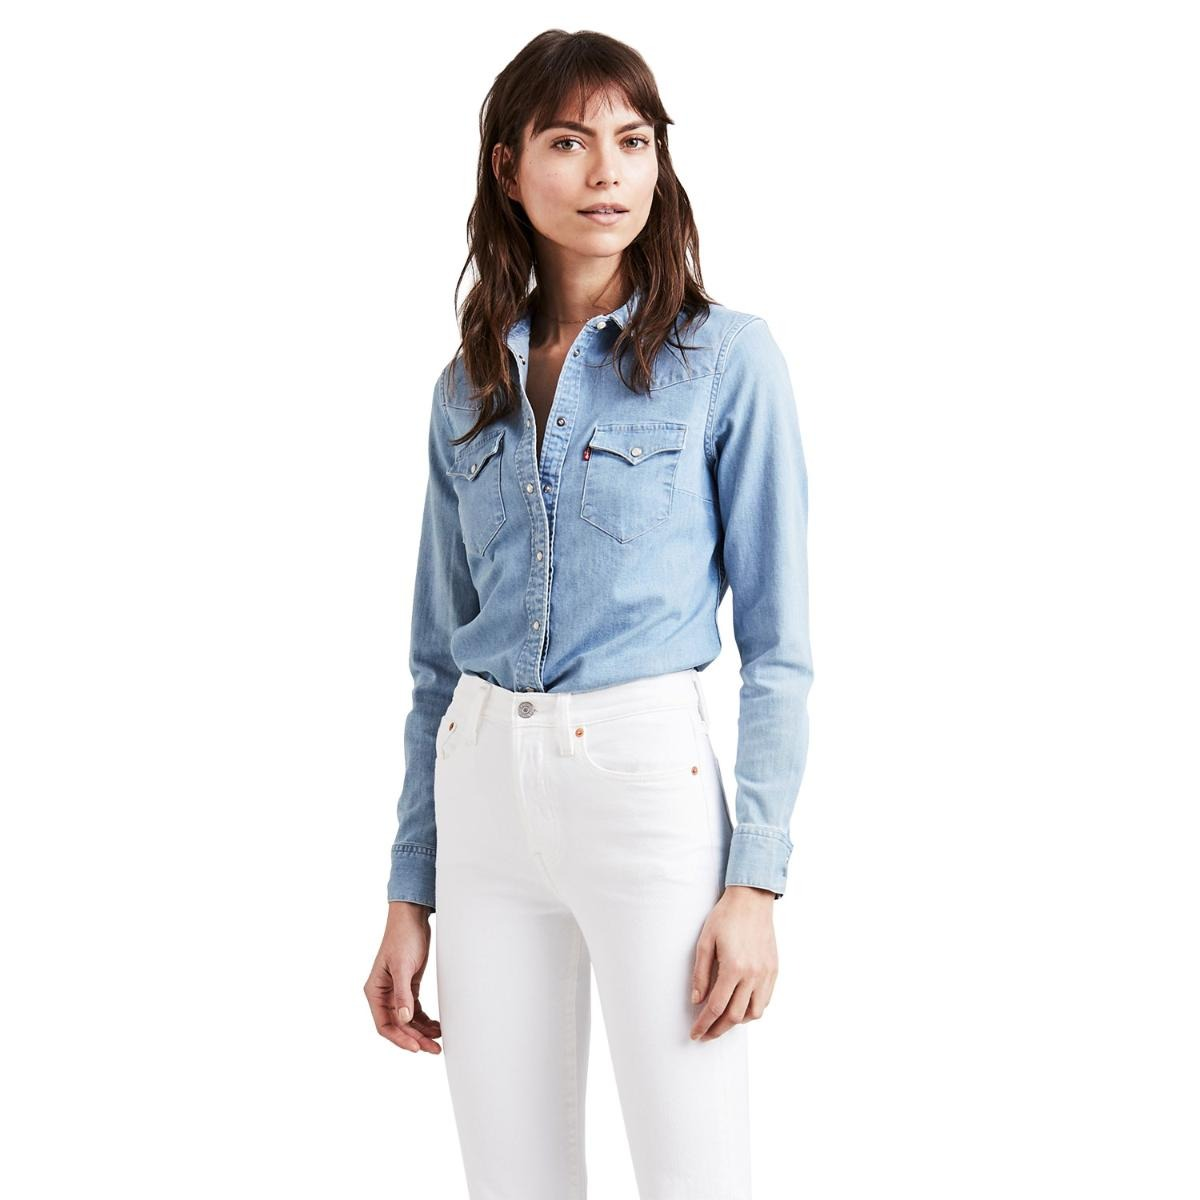 dc4b7afaba camisa jeans levis tailored classic western lavagem clara. Carregando zoom.